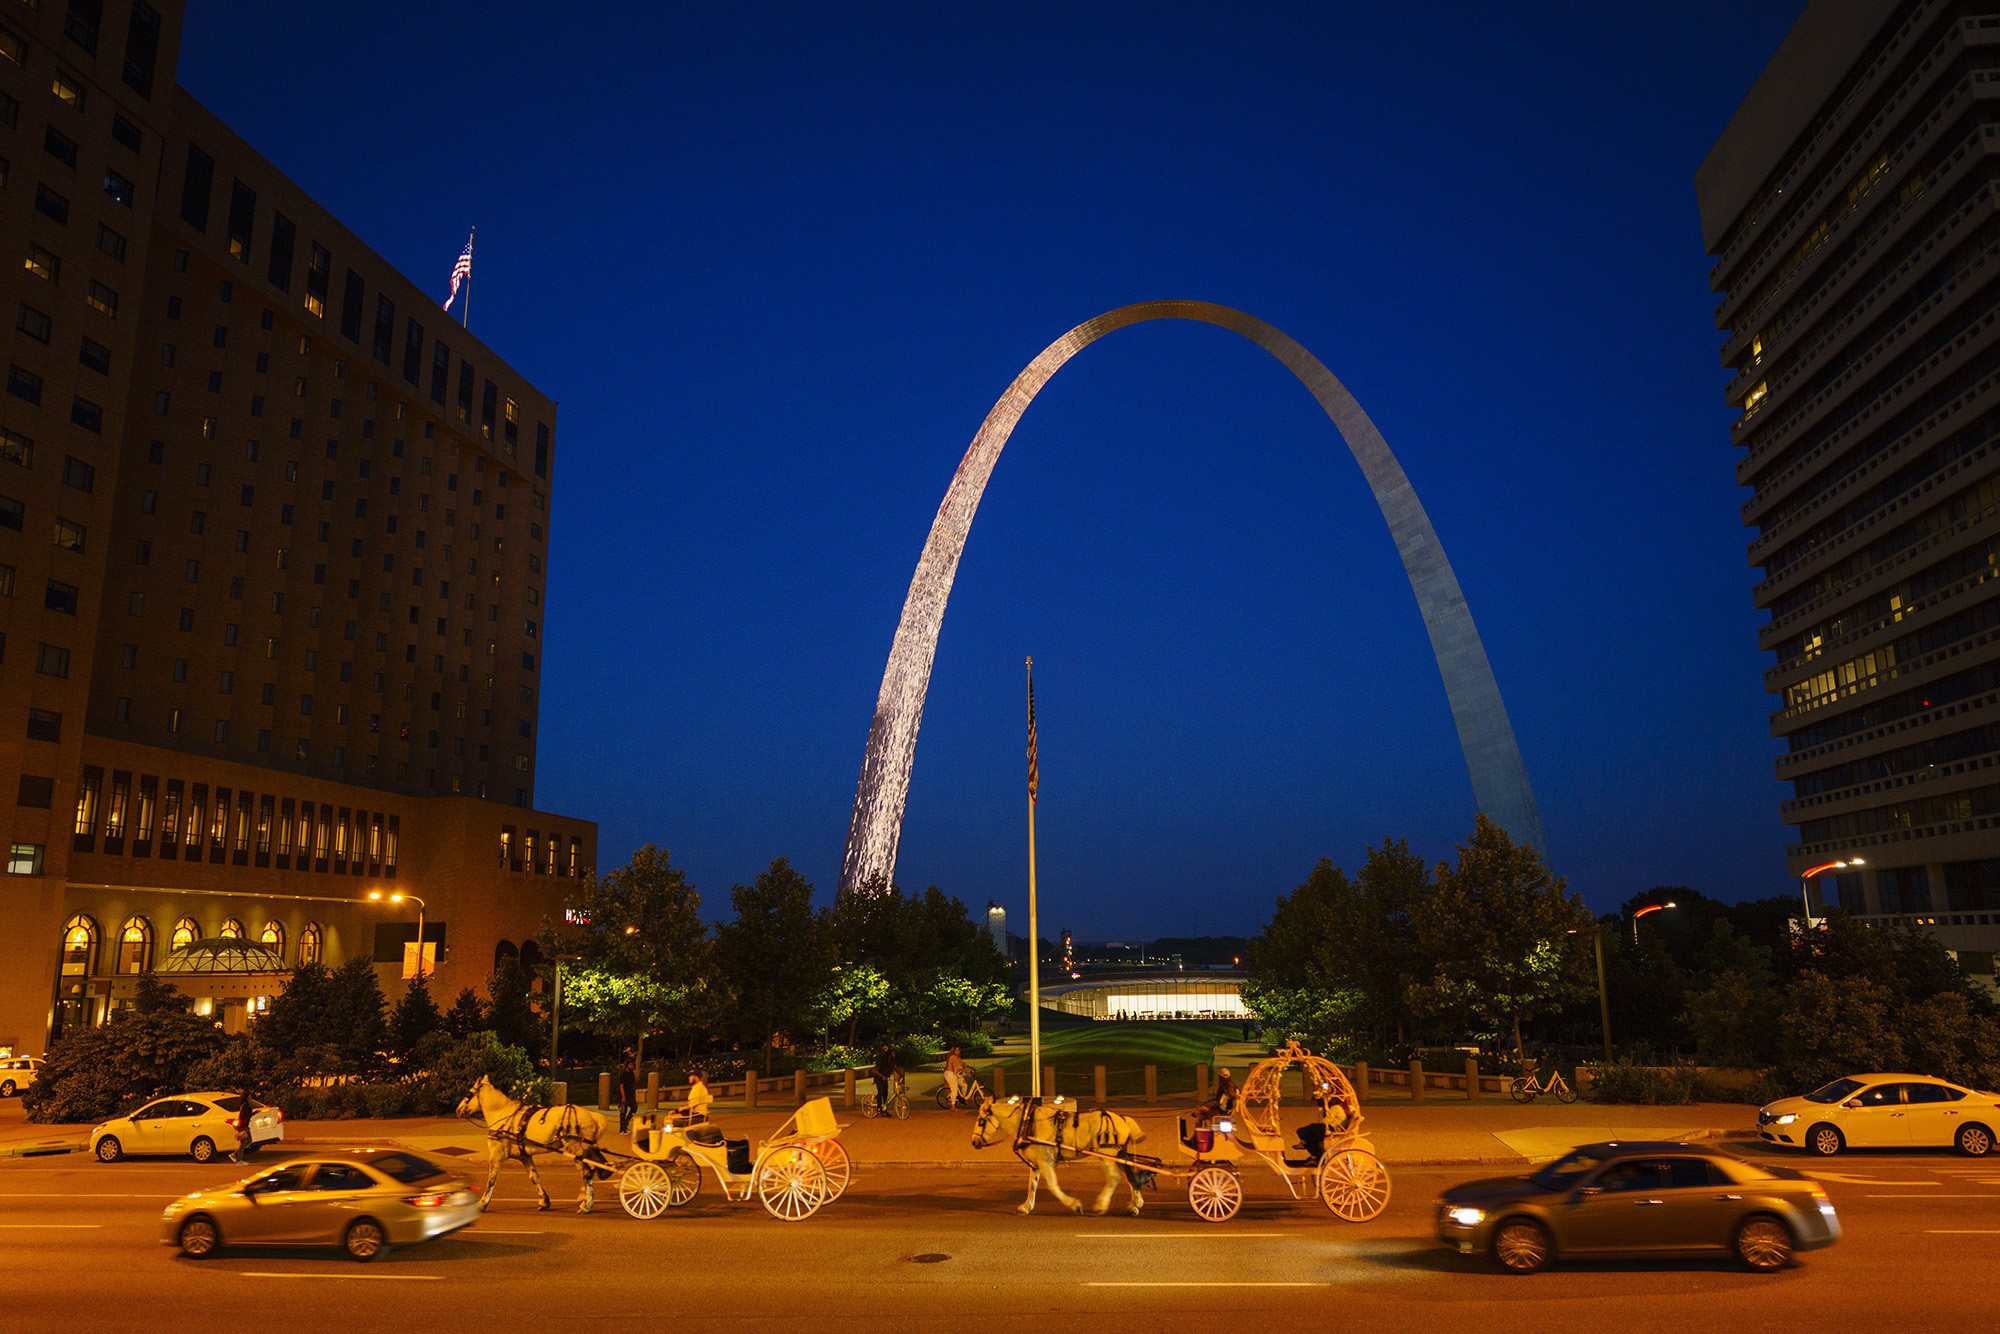 b73c6e6db94f You re going where  St. Louis - Chicago Tribune